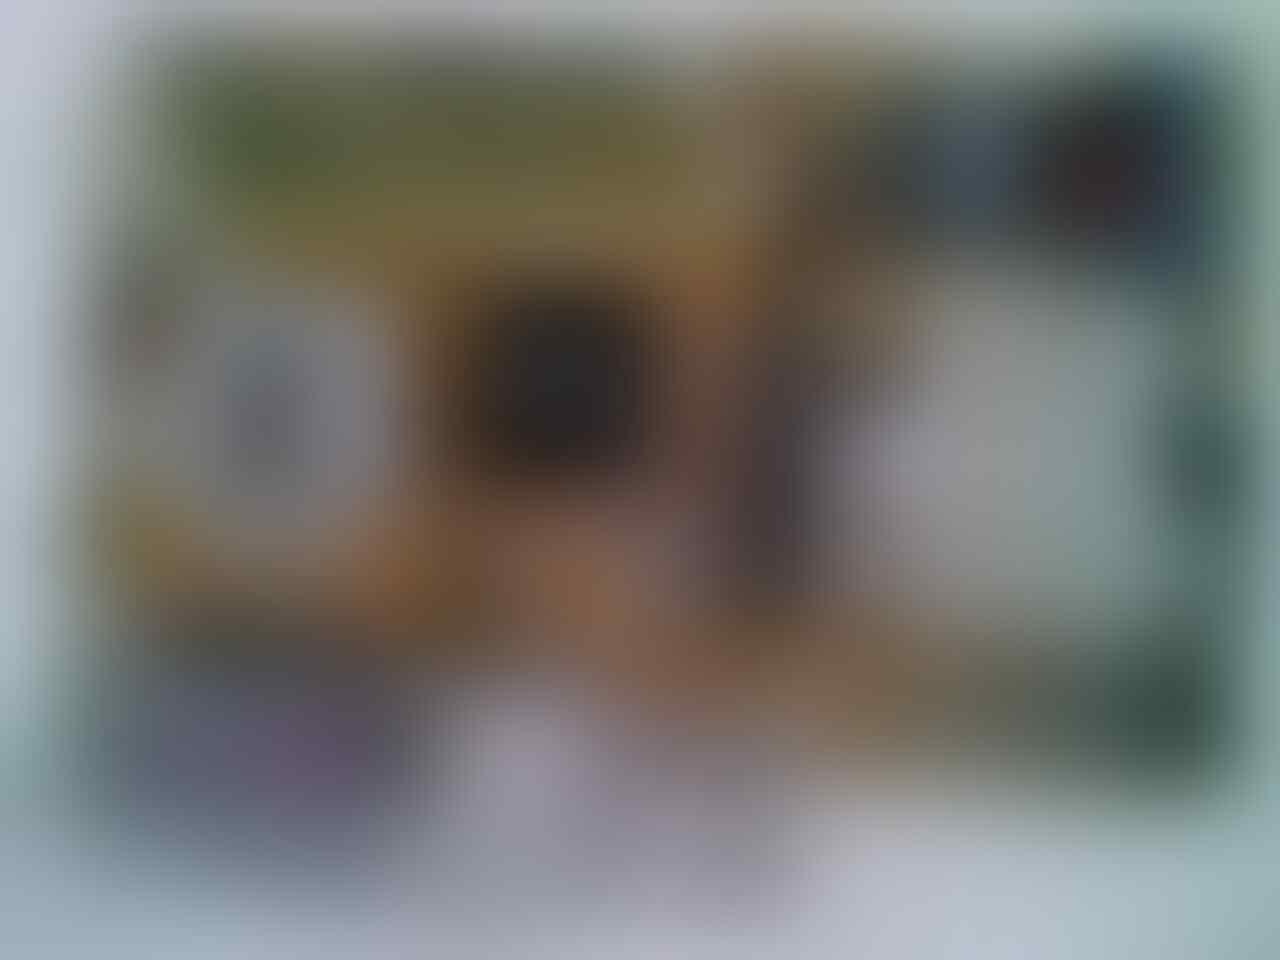 Jual Mobo ASUS P5LD2 SE 2nd